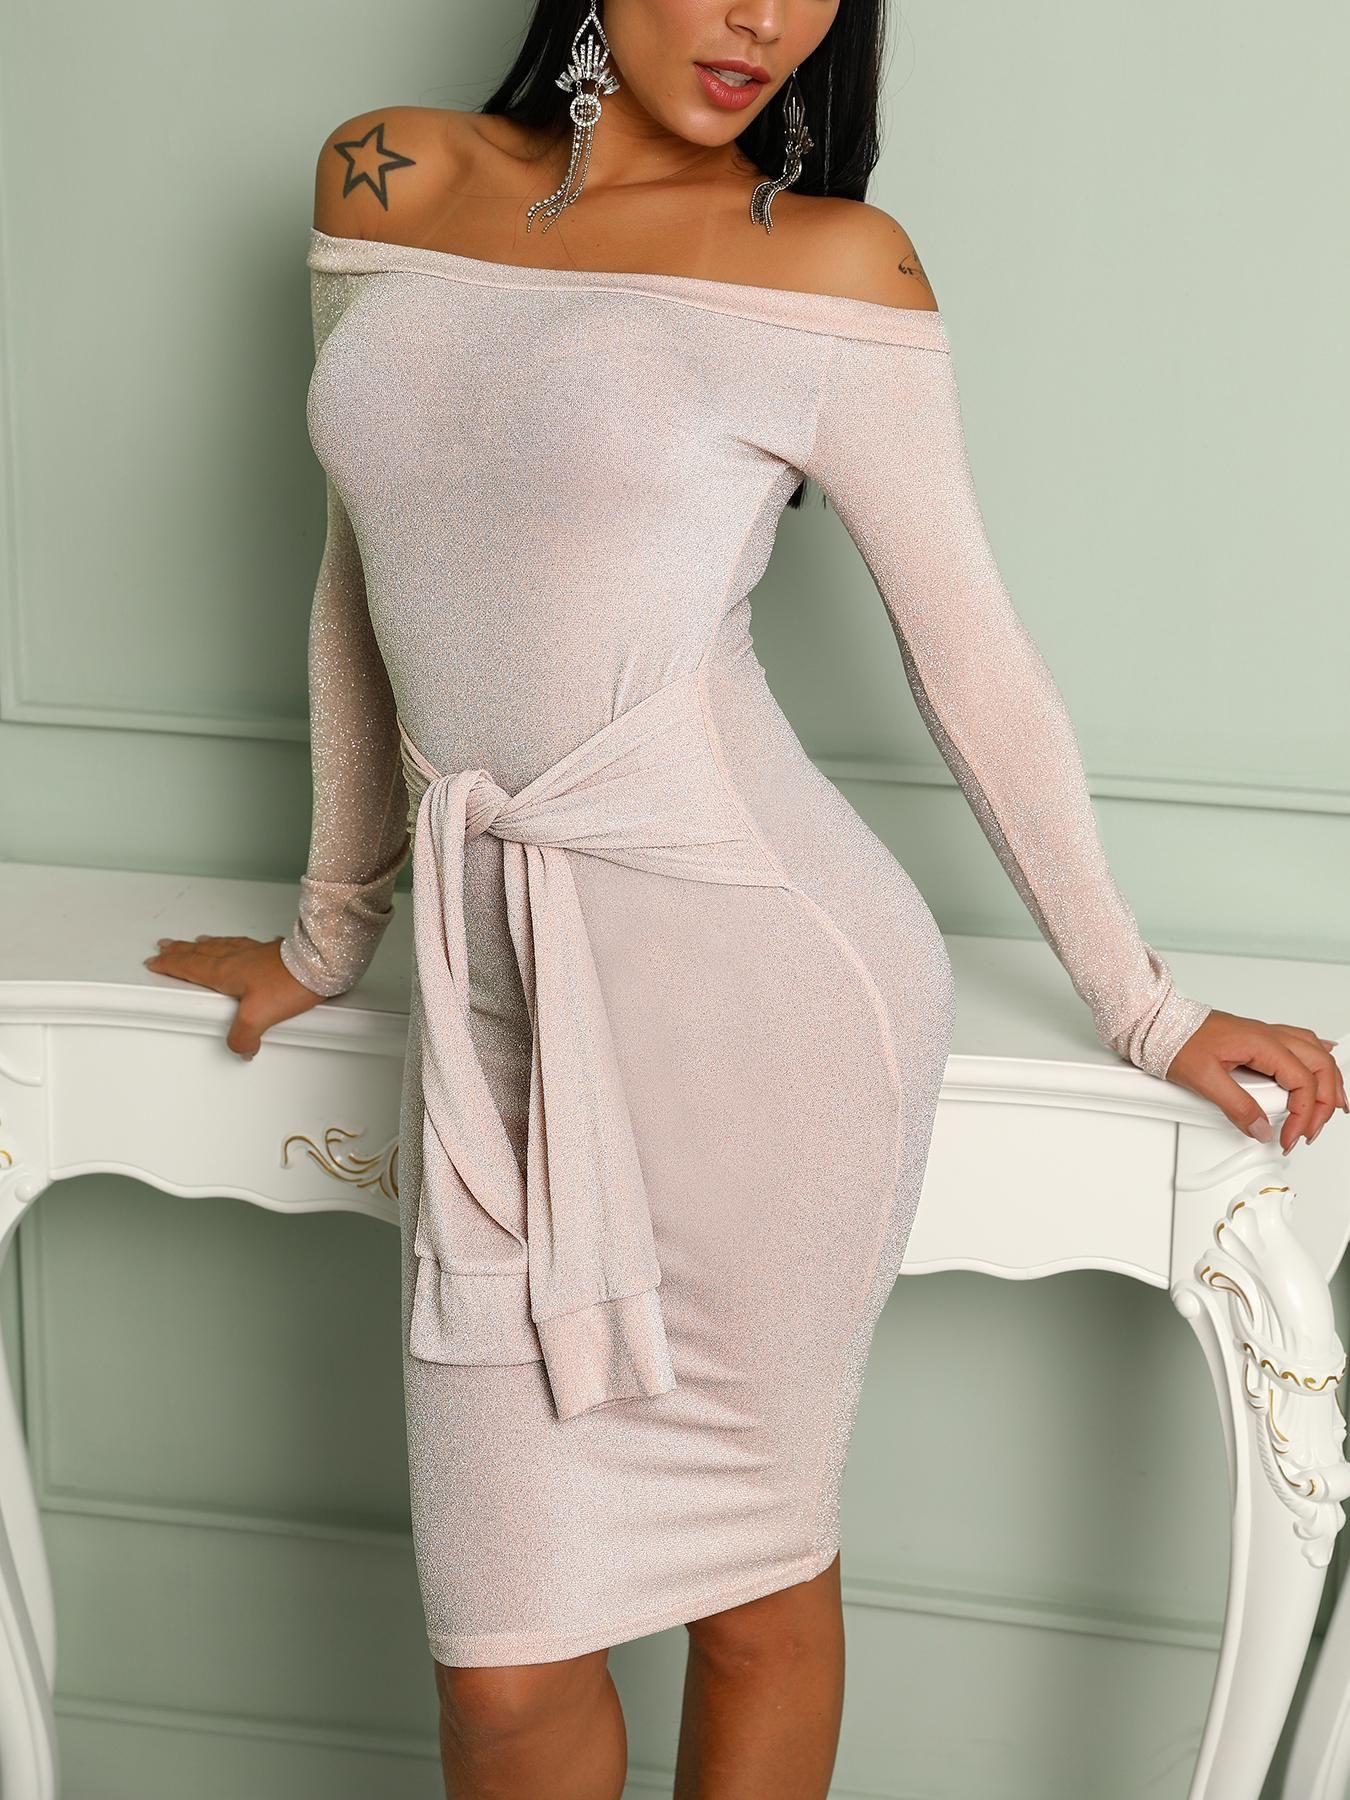 60% OFF Vintage dresses fashion Bodycon dress Mini dress Sweater cardigan  White tops Burgundy cardigan Floral bodycon Fashion outfits Bodycon dress  Women s ... 2addfb411